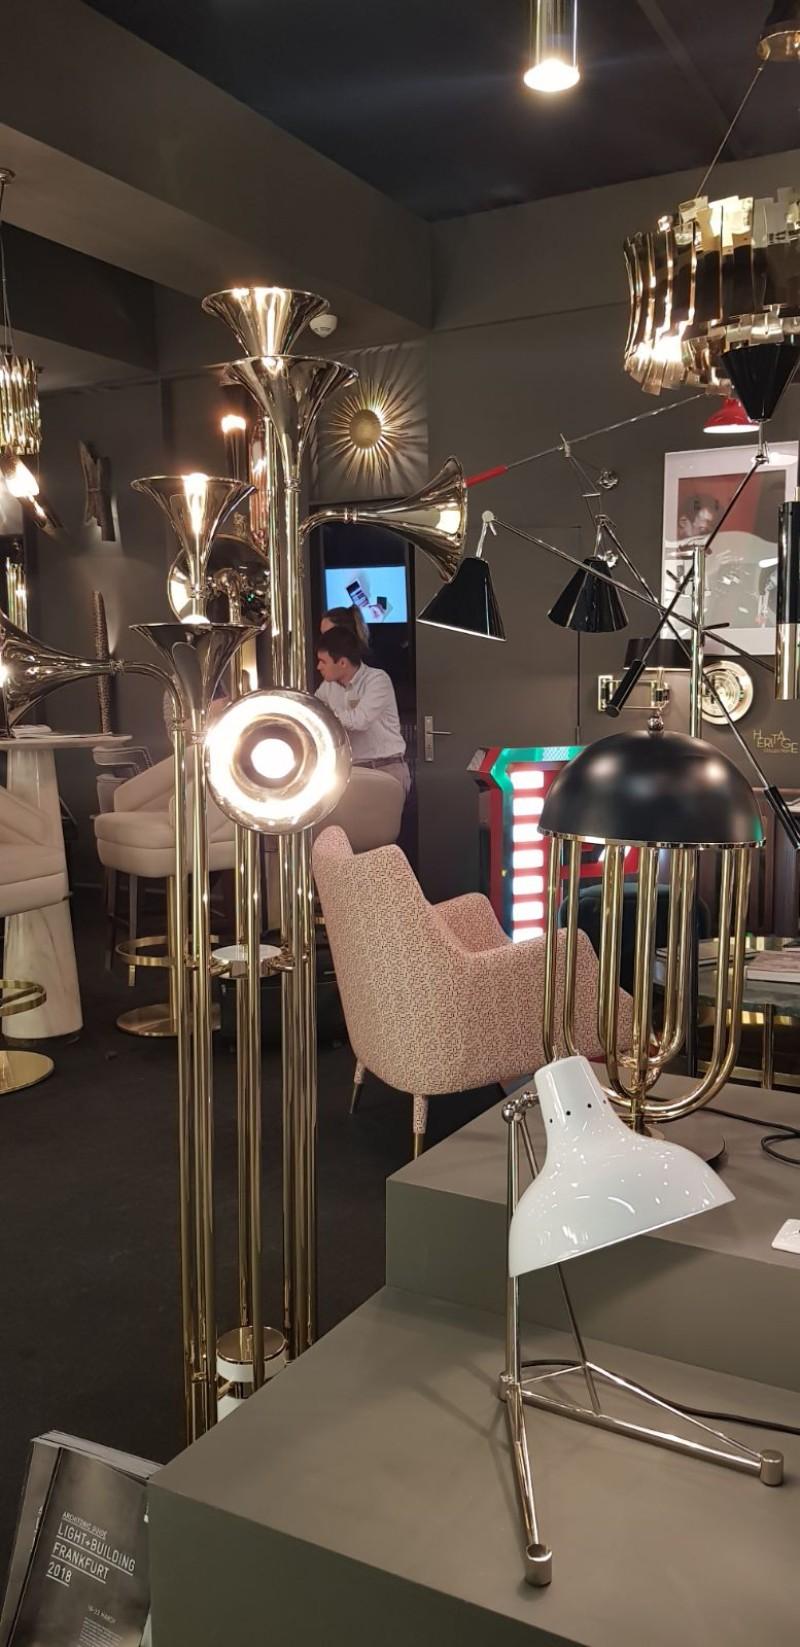 luxusmarken Top 5 Luxusmarken in der Frankfurt Messe 38480cbd 2c0e 46bd 911b a4ecc66a39d9